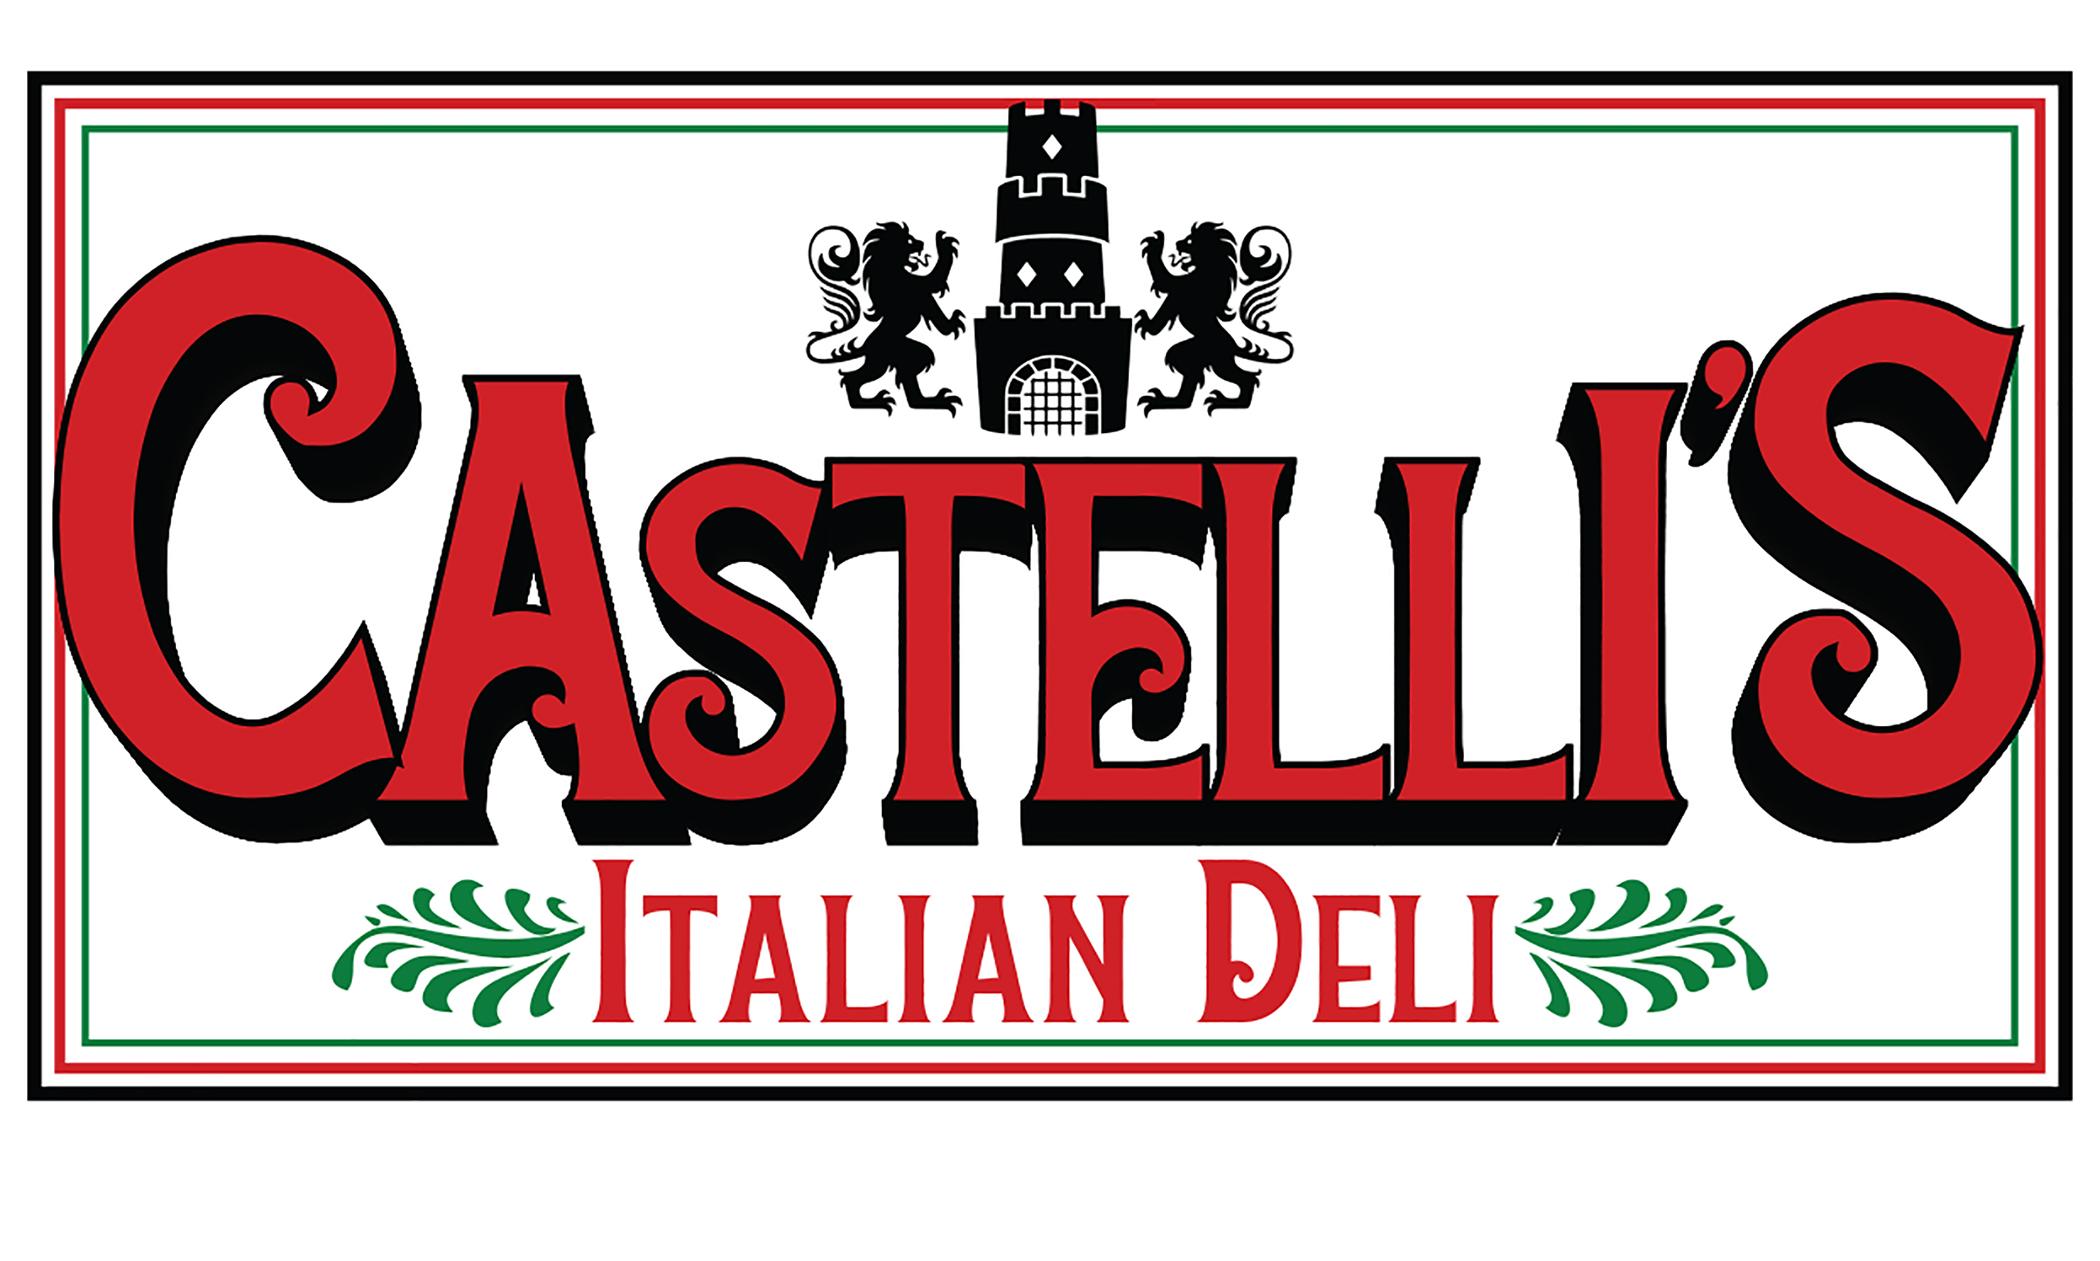 Castelli's sign